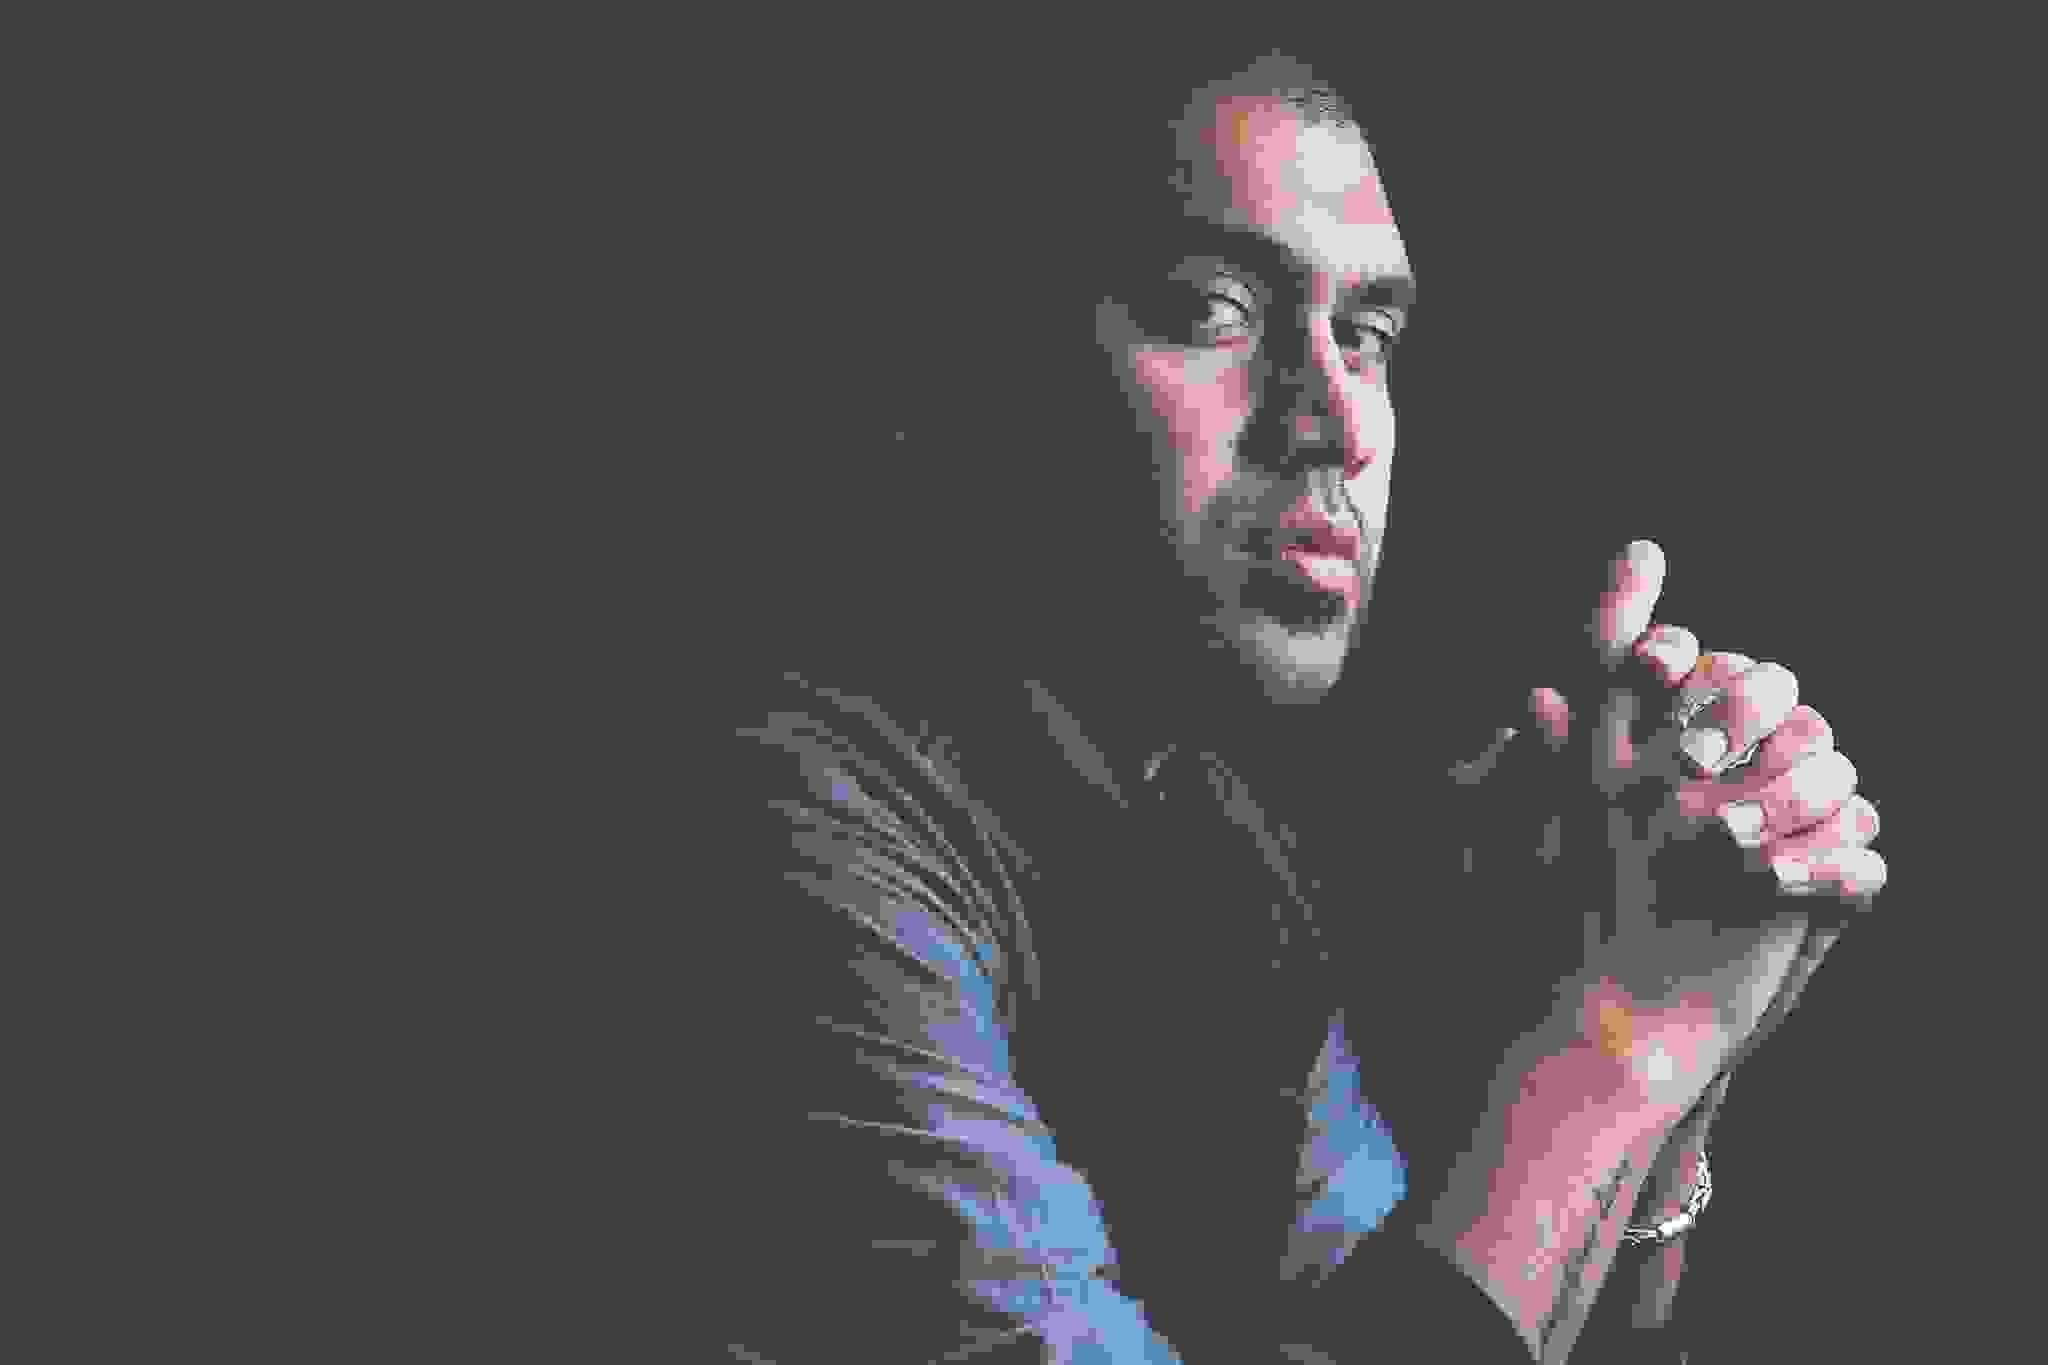 Omar Musa: Millefiori